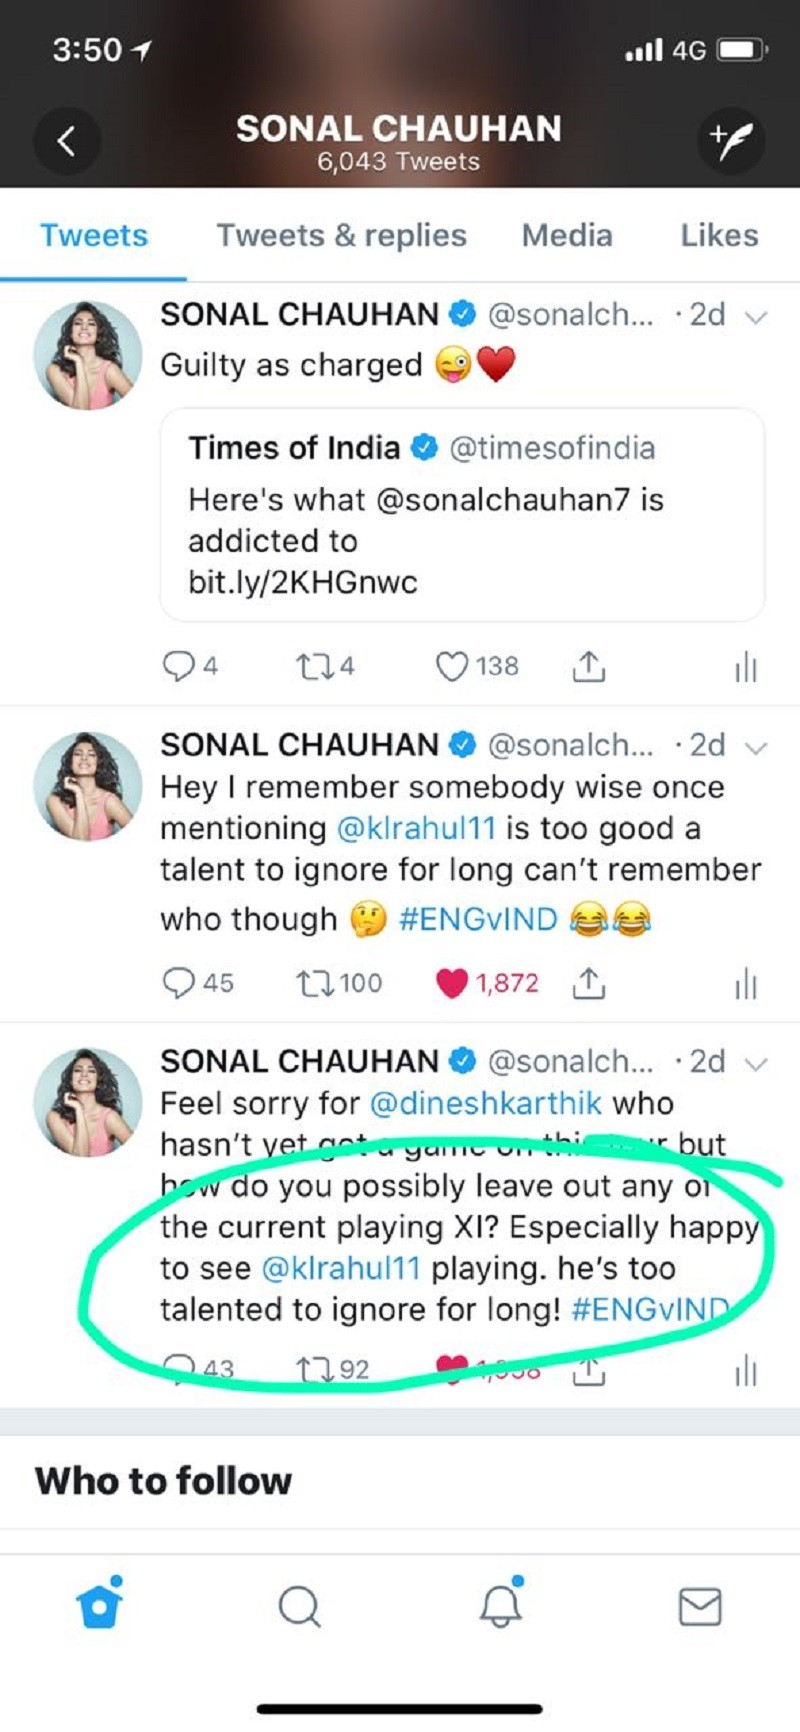 Sonal Chauhan KL Rahul Tweet 2